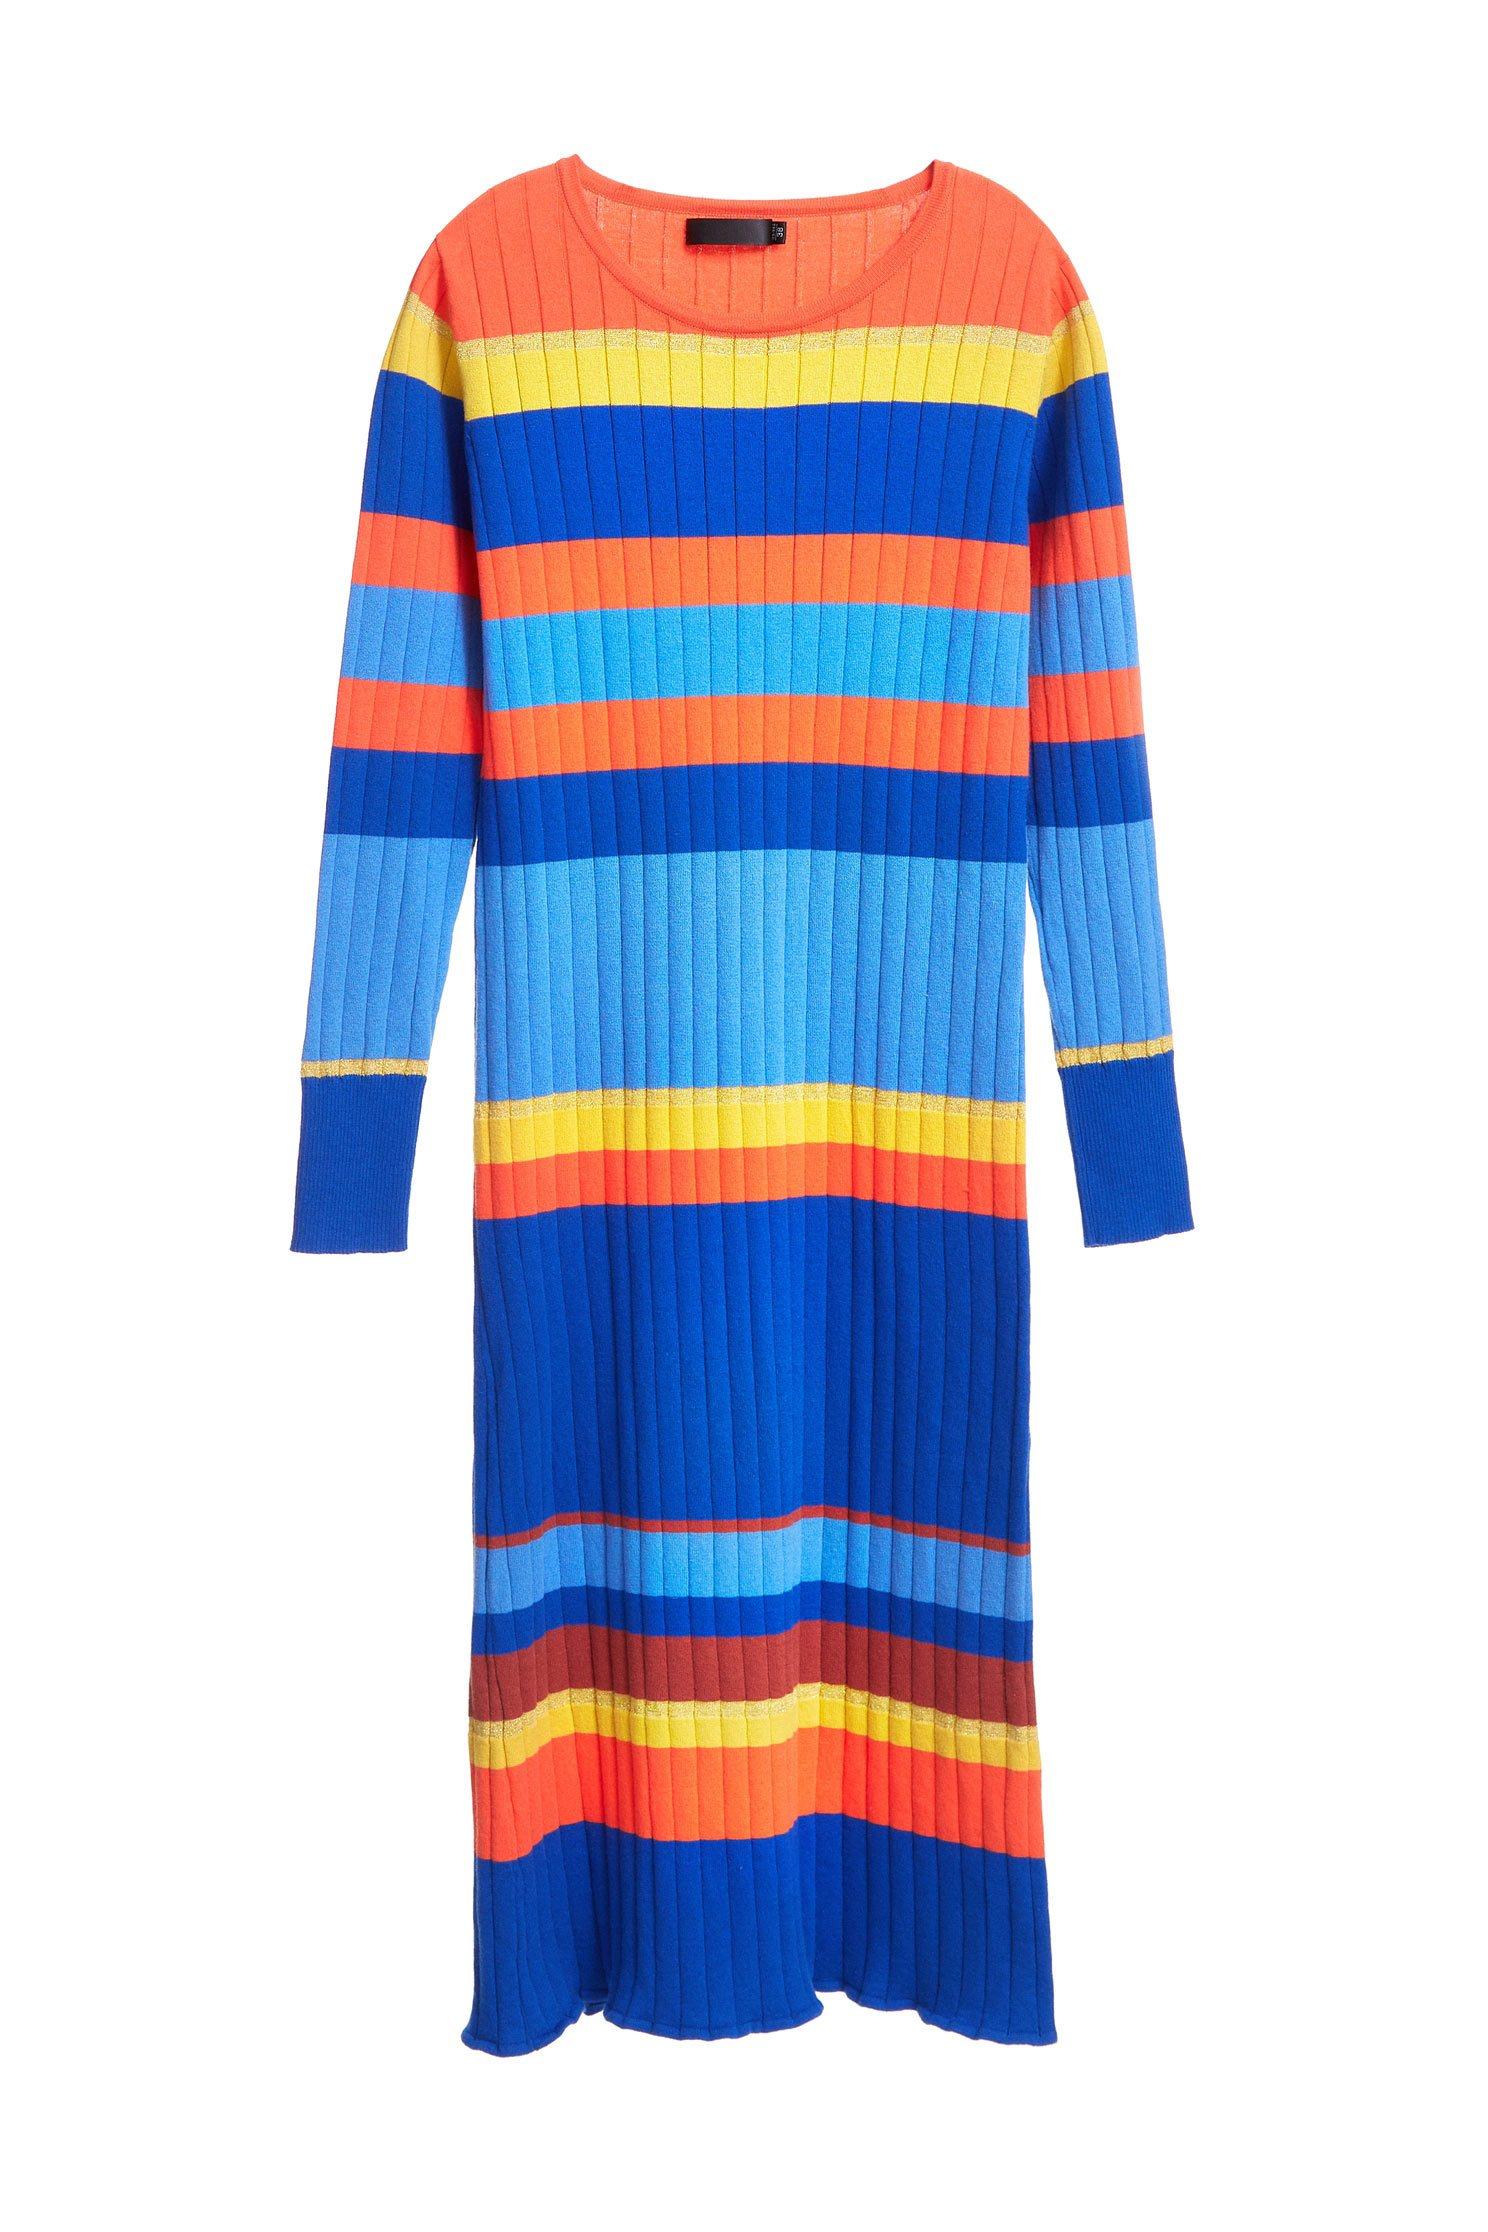 Ribbed Stripe Knit  Dress,cocktaildress,knitting,knitteddress,longsleevedress